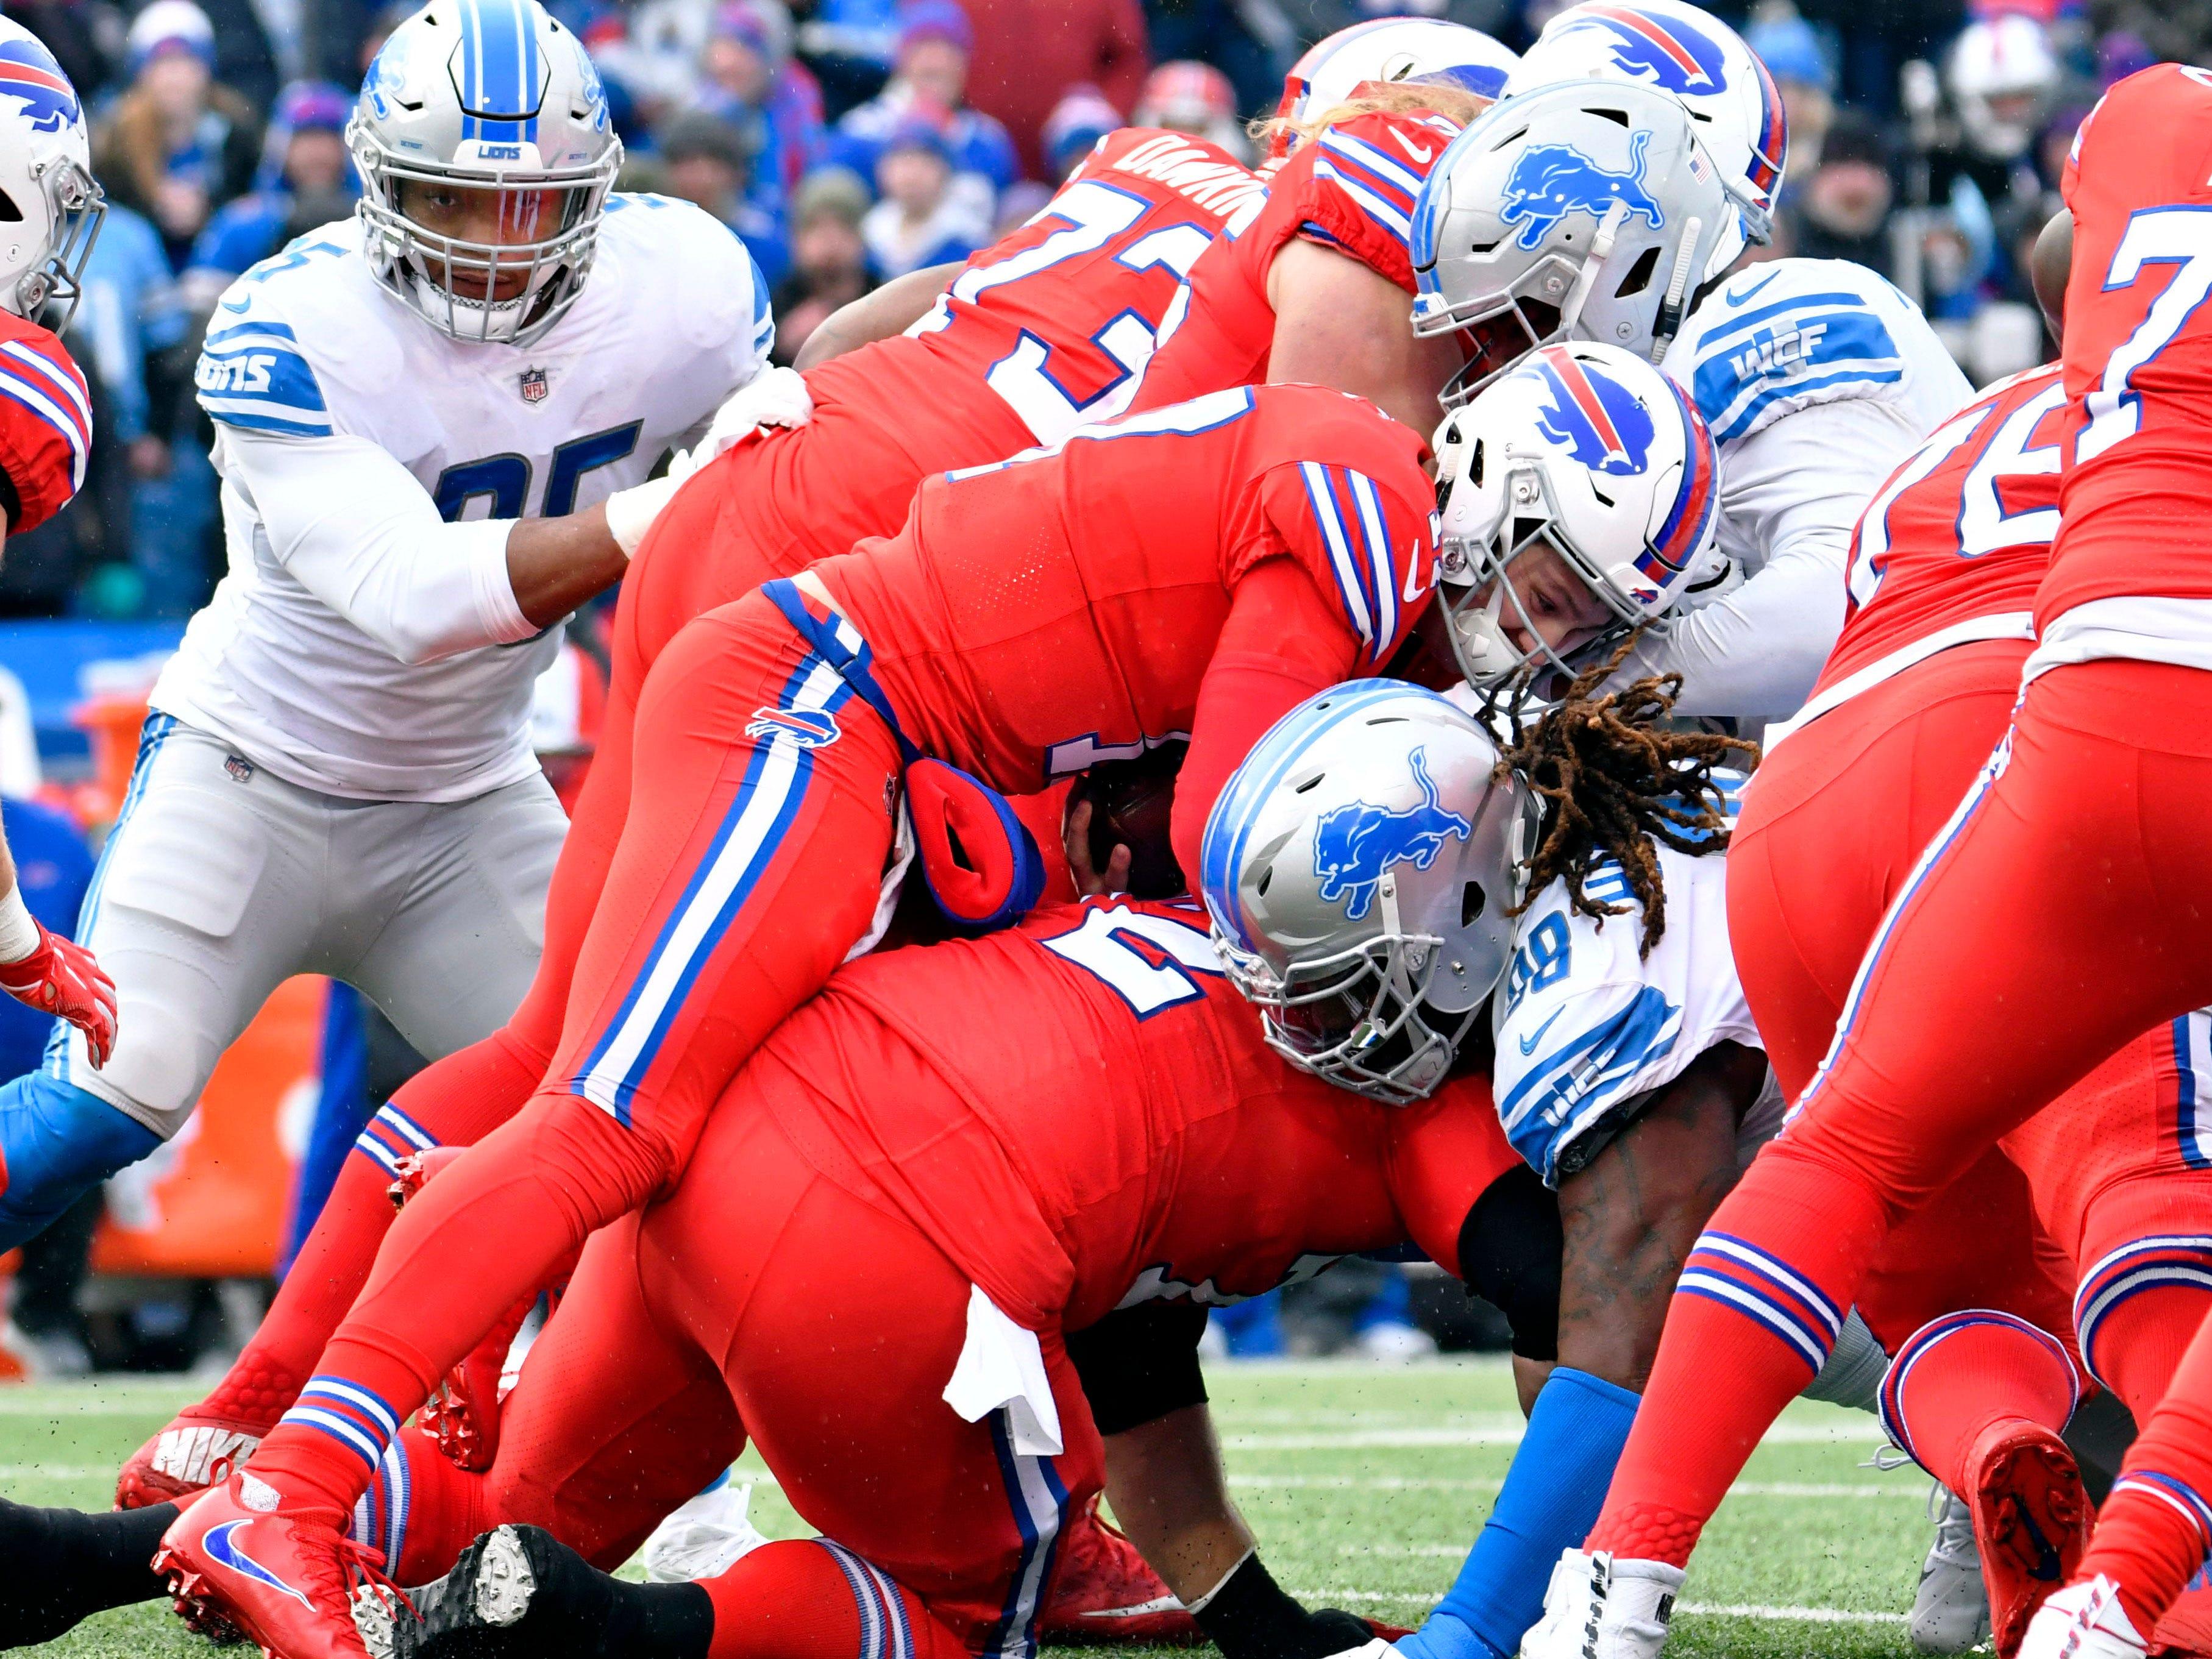 Bills quarterback Josh Allen (17) runs a quarterback sneak for a first down against the Lions.